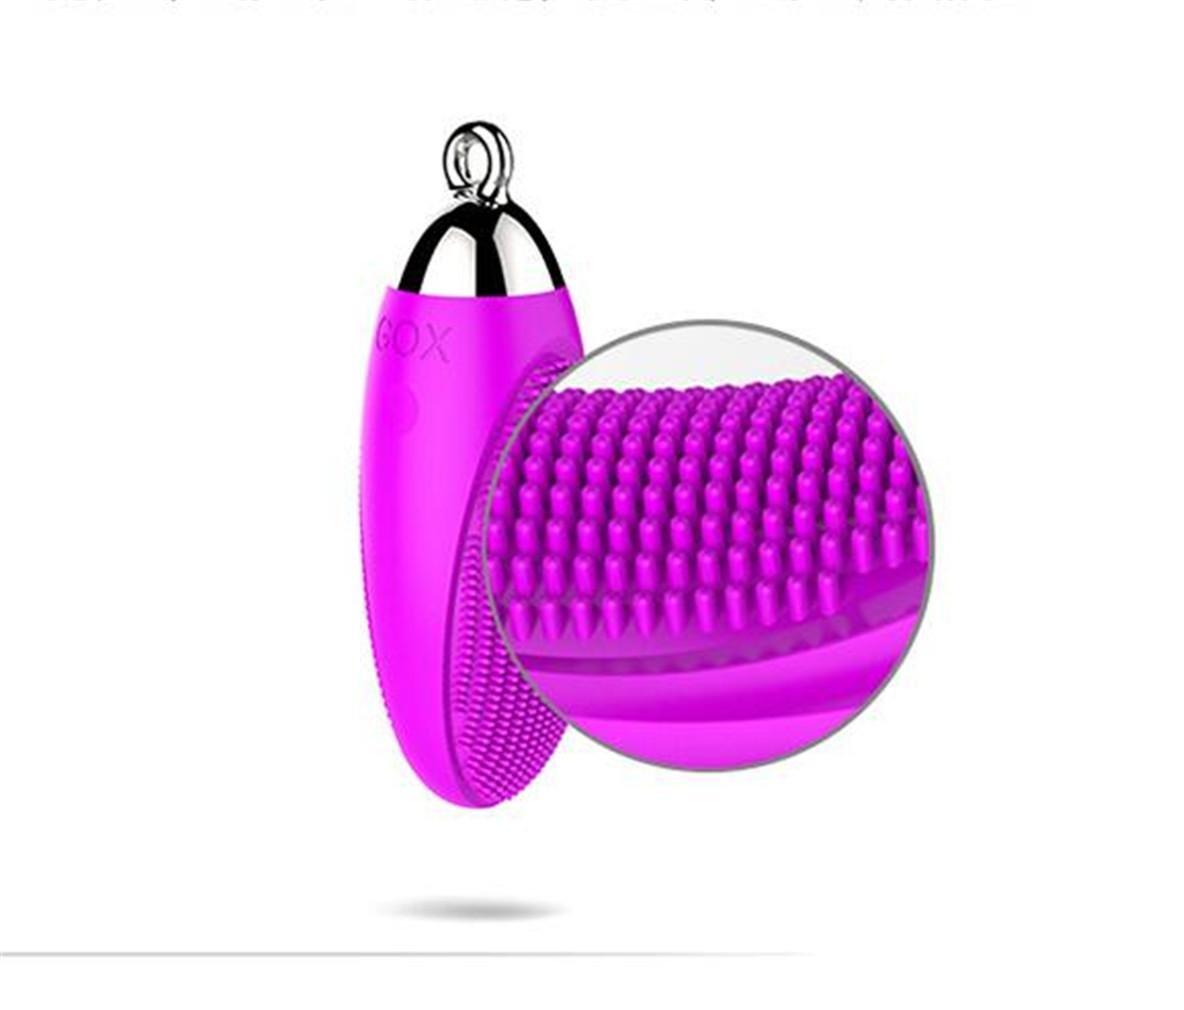 LY-JFSZ Waterproof Mini Huevo Huevo Mini Vibrador Girl con G Point Parejas Salud, Pink 250267